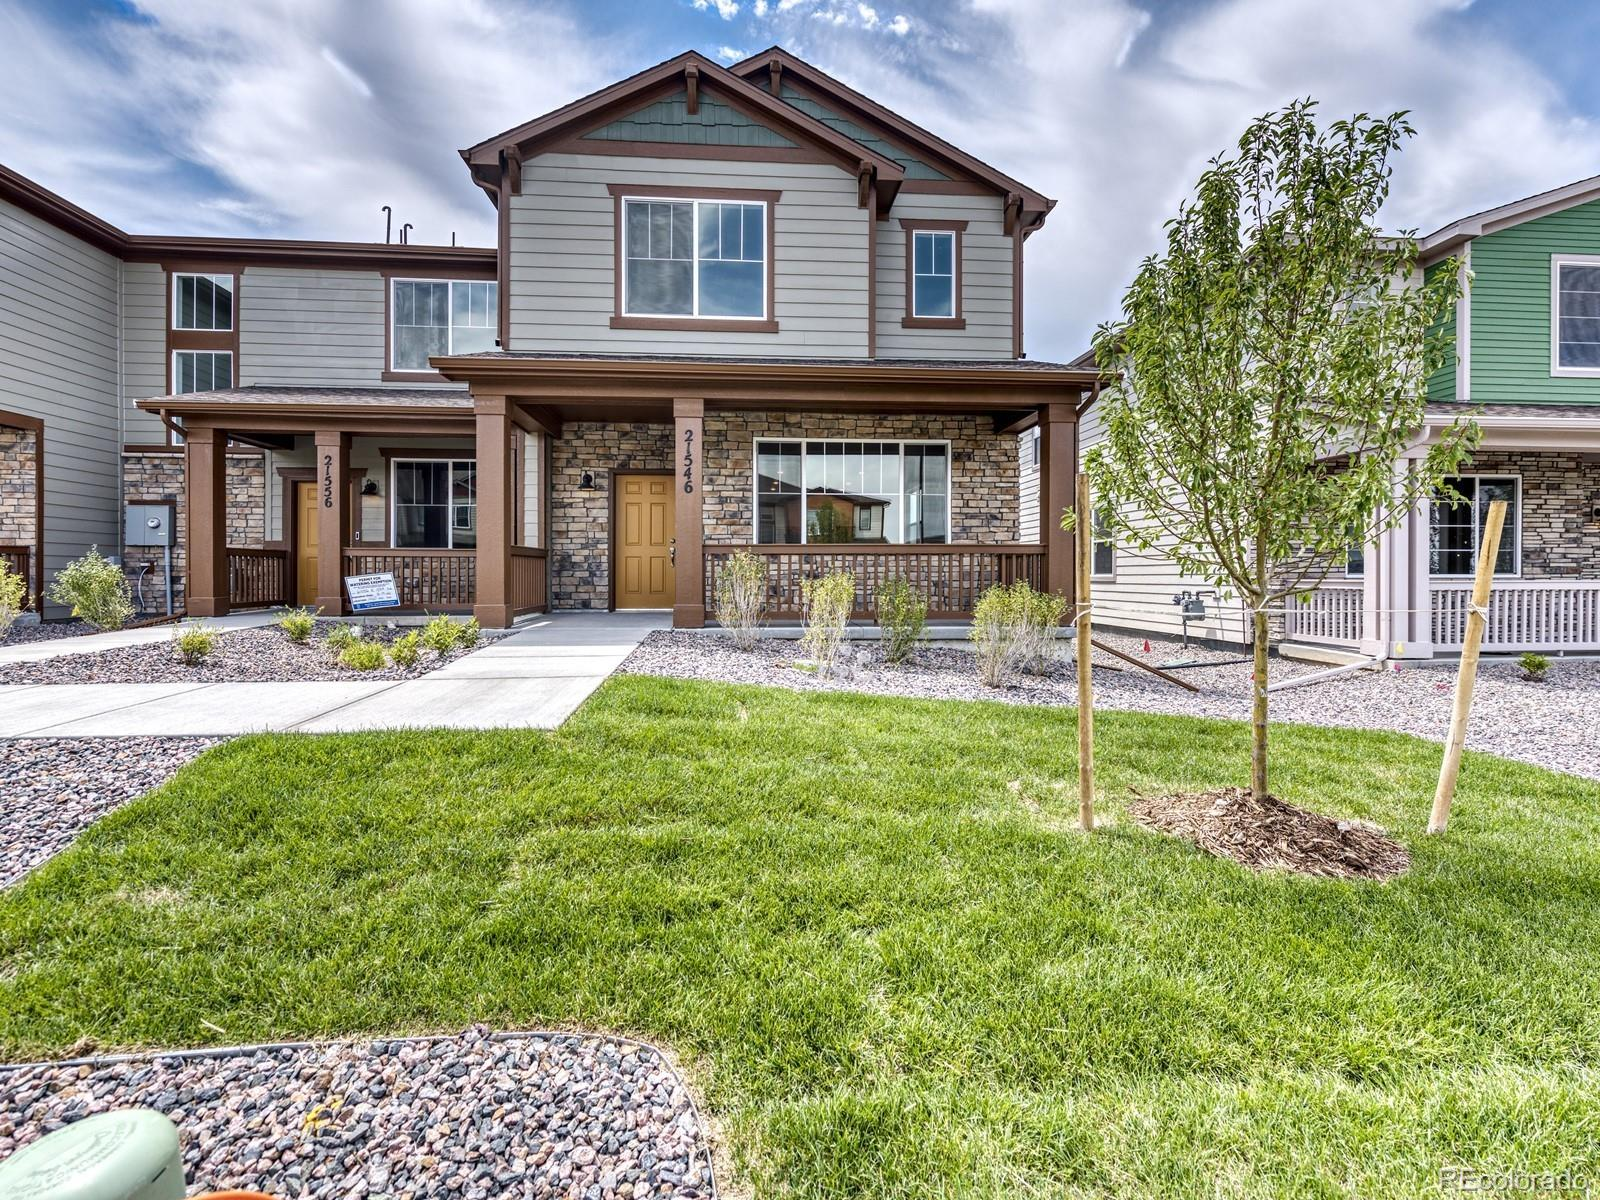 21546 E 59th Place Property Photo - Aurora, CO real estate listing